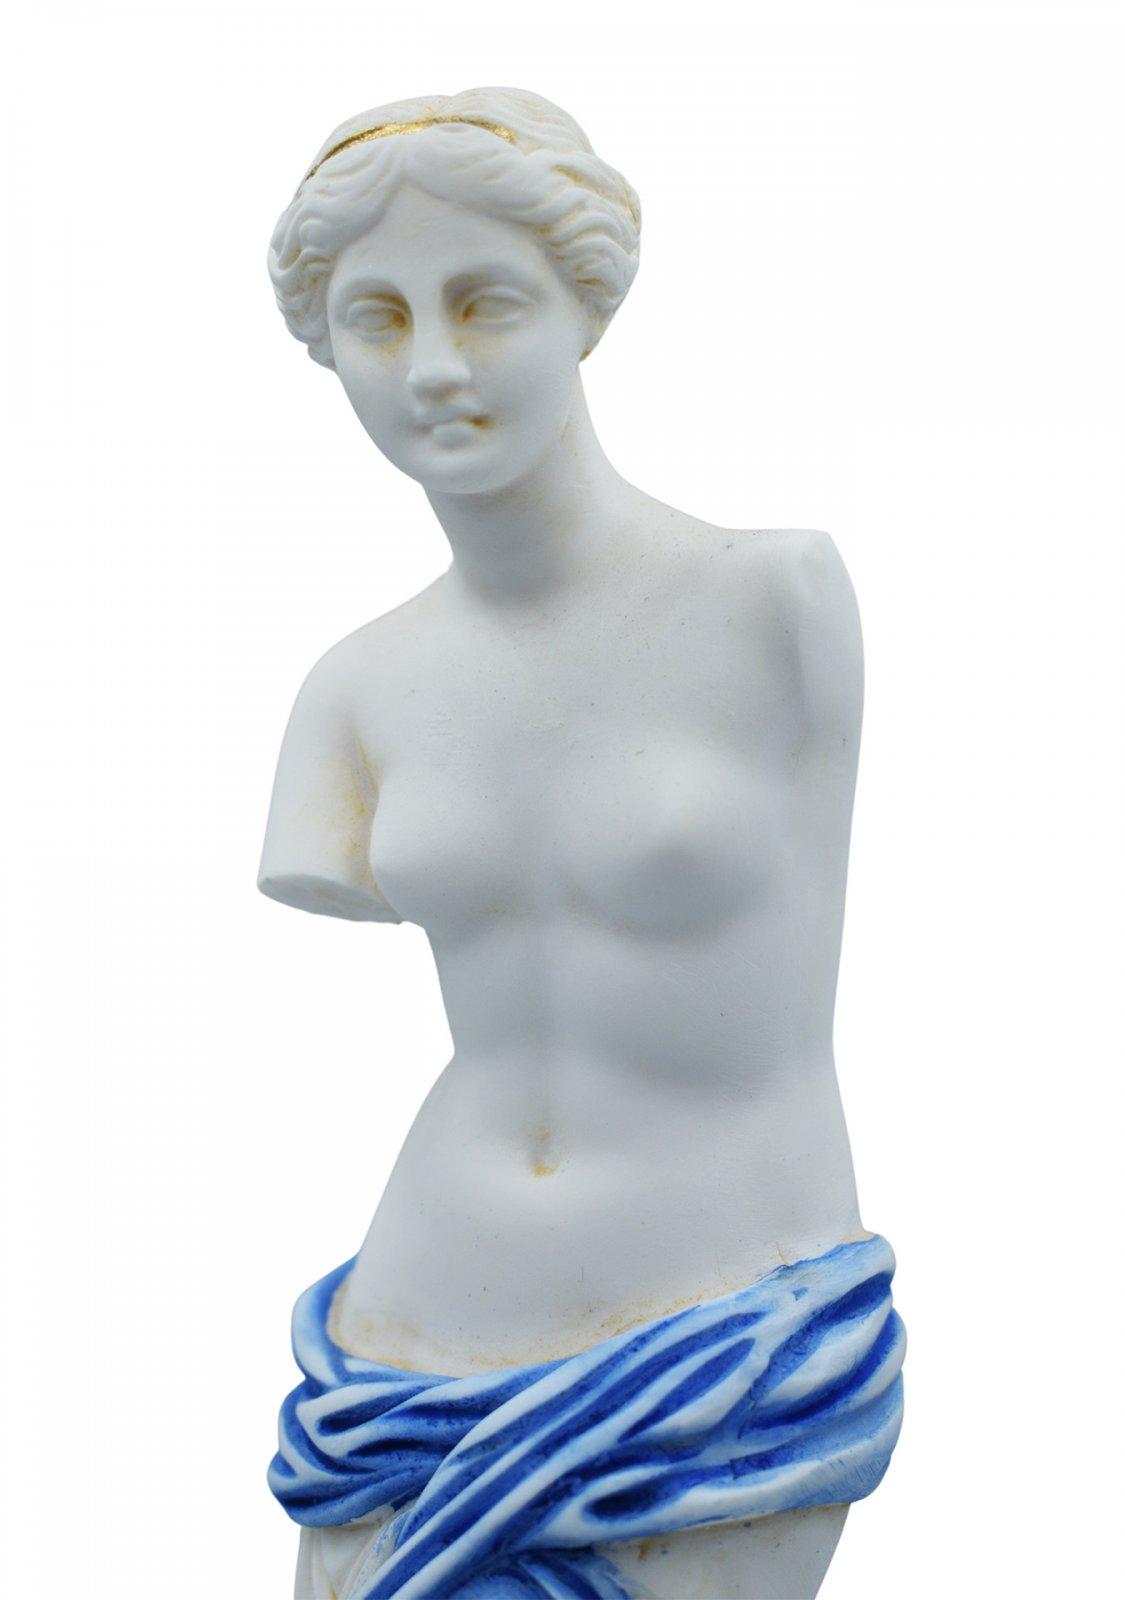 Aphrodite of Milos (Venus de Milo) greek alabaster statue with blue color and golden details